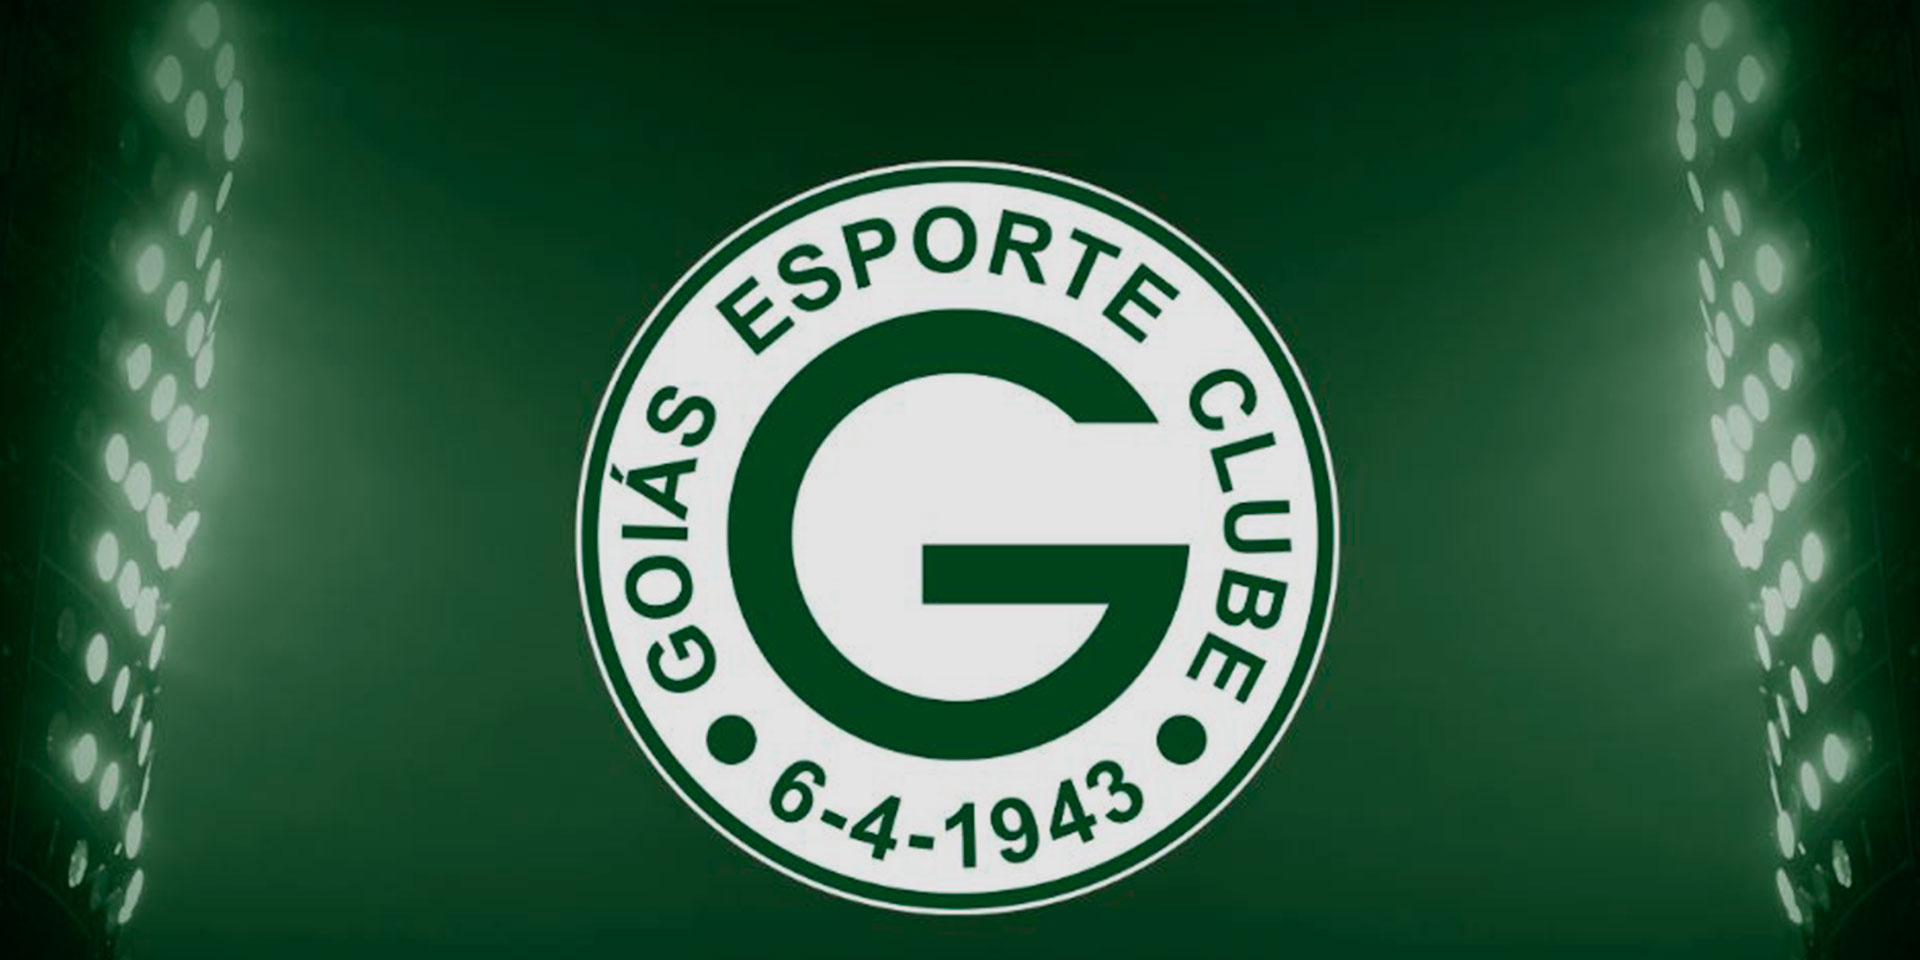 Os melhores jogadores do Goiás para se escalar no CartolaFC 2019